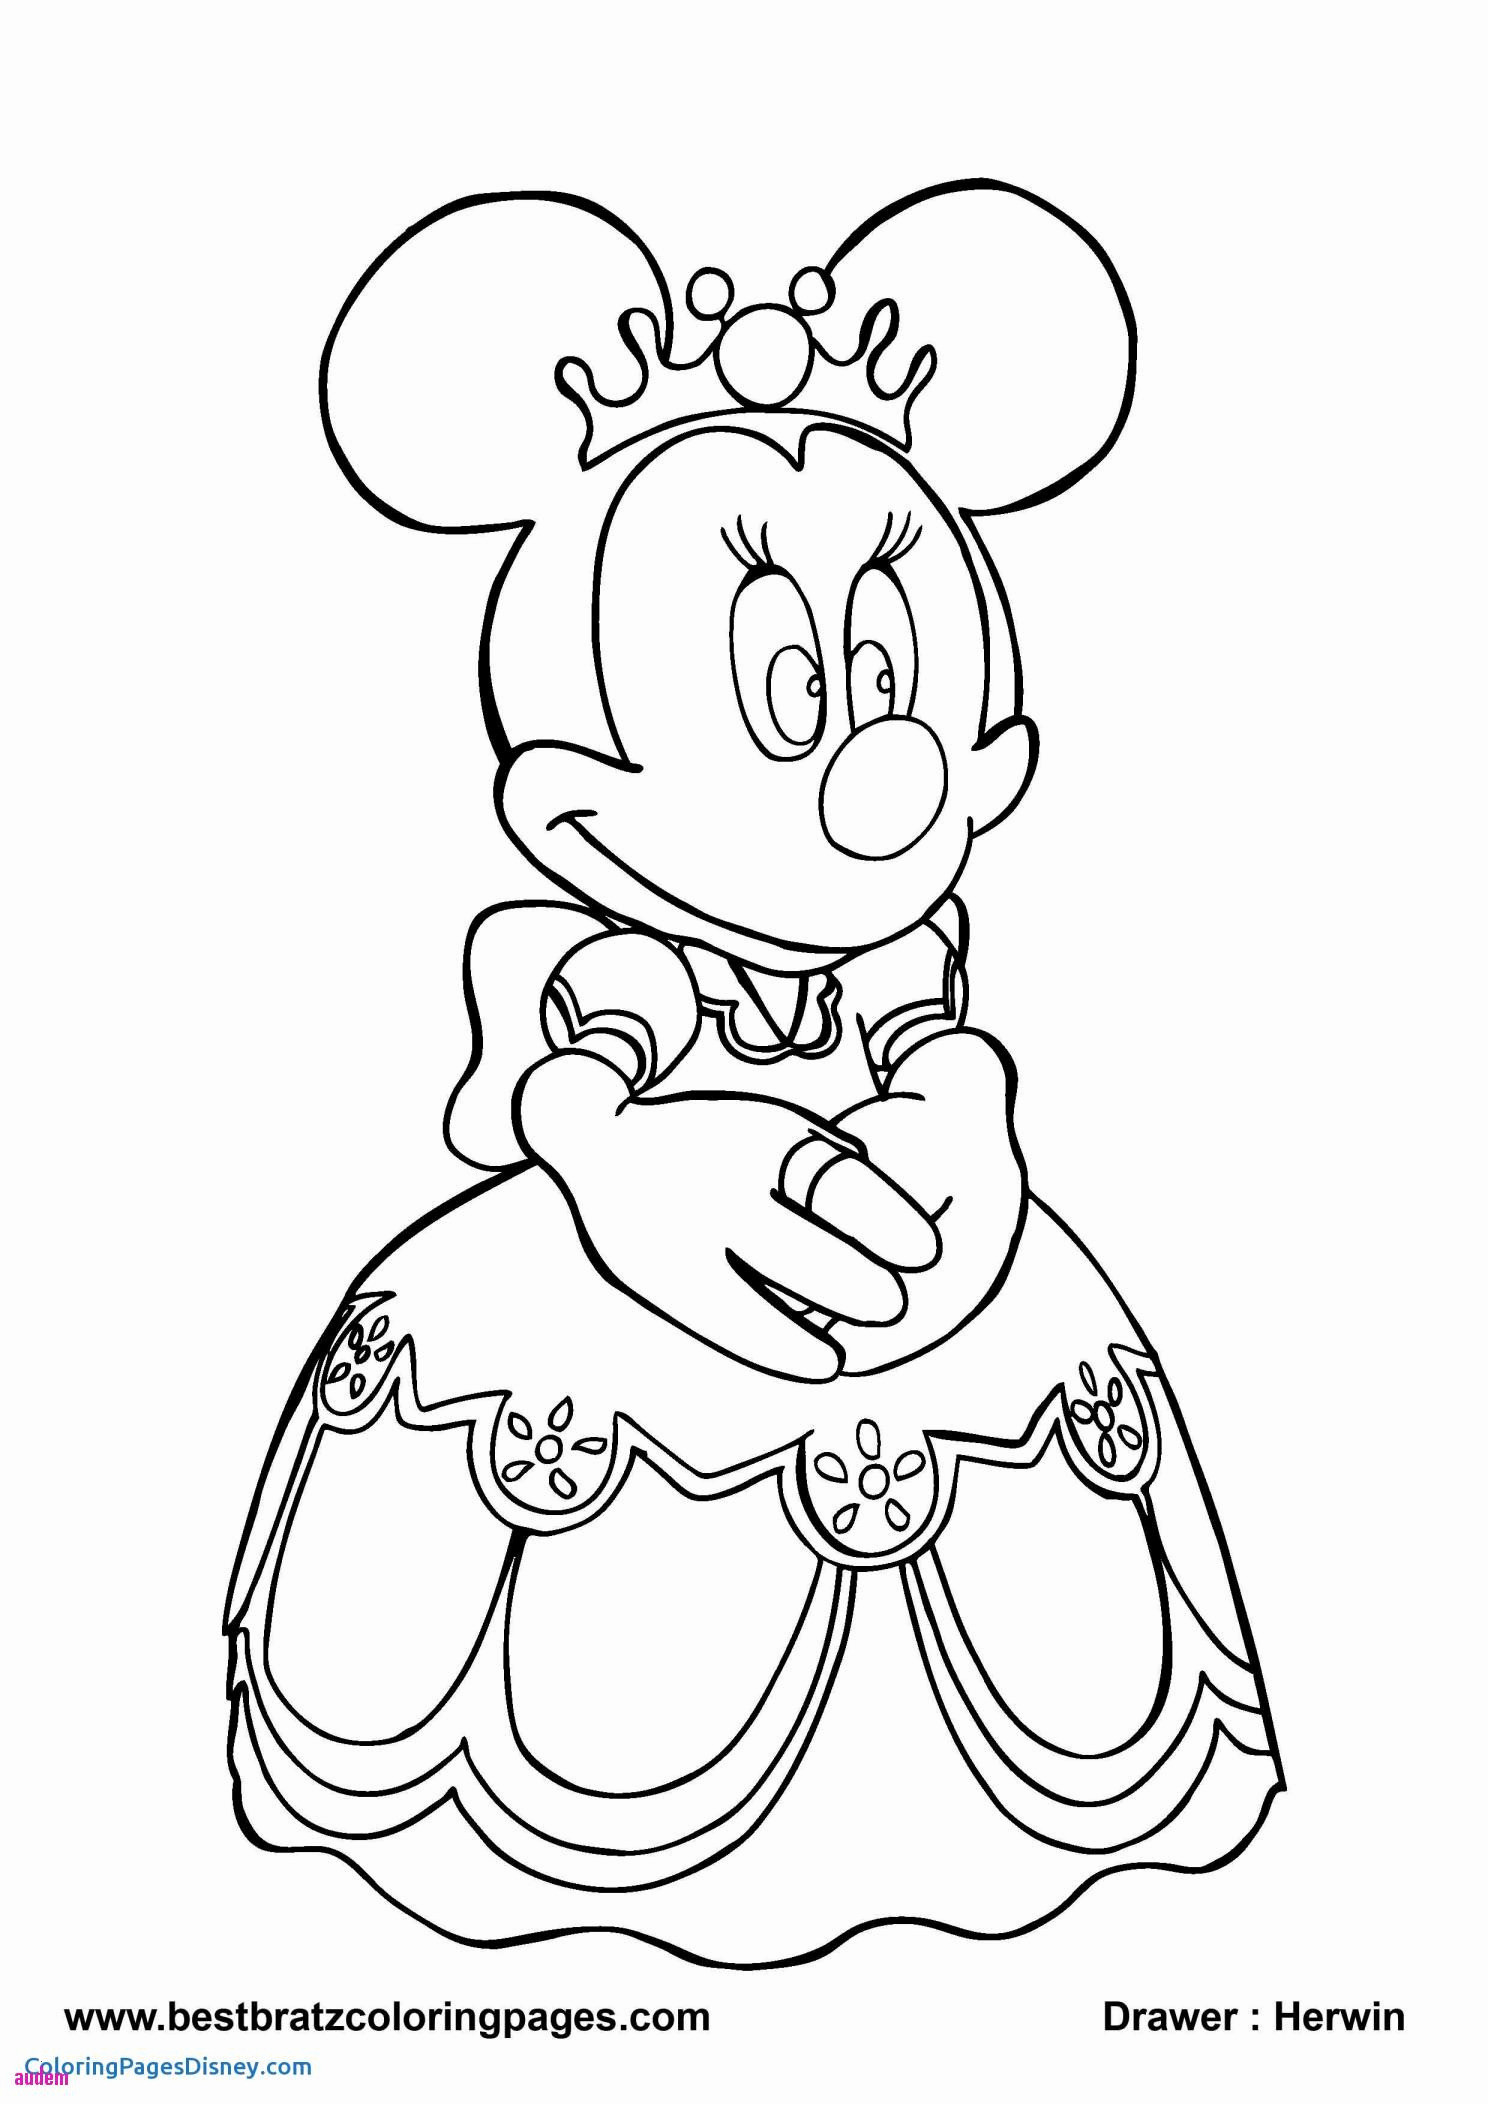 Micky Maus Bilder Zum Ausmalen Inspirierend 40 Frisch Mickey Mouse